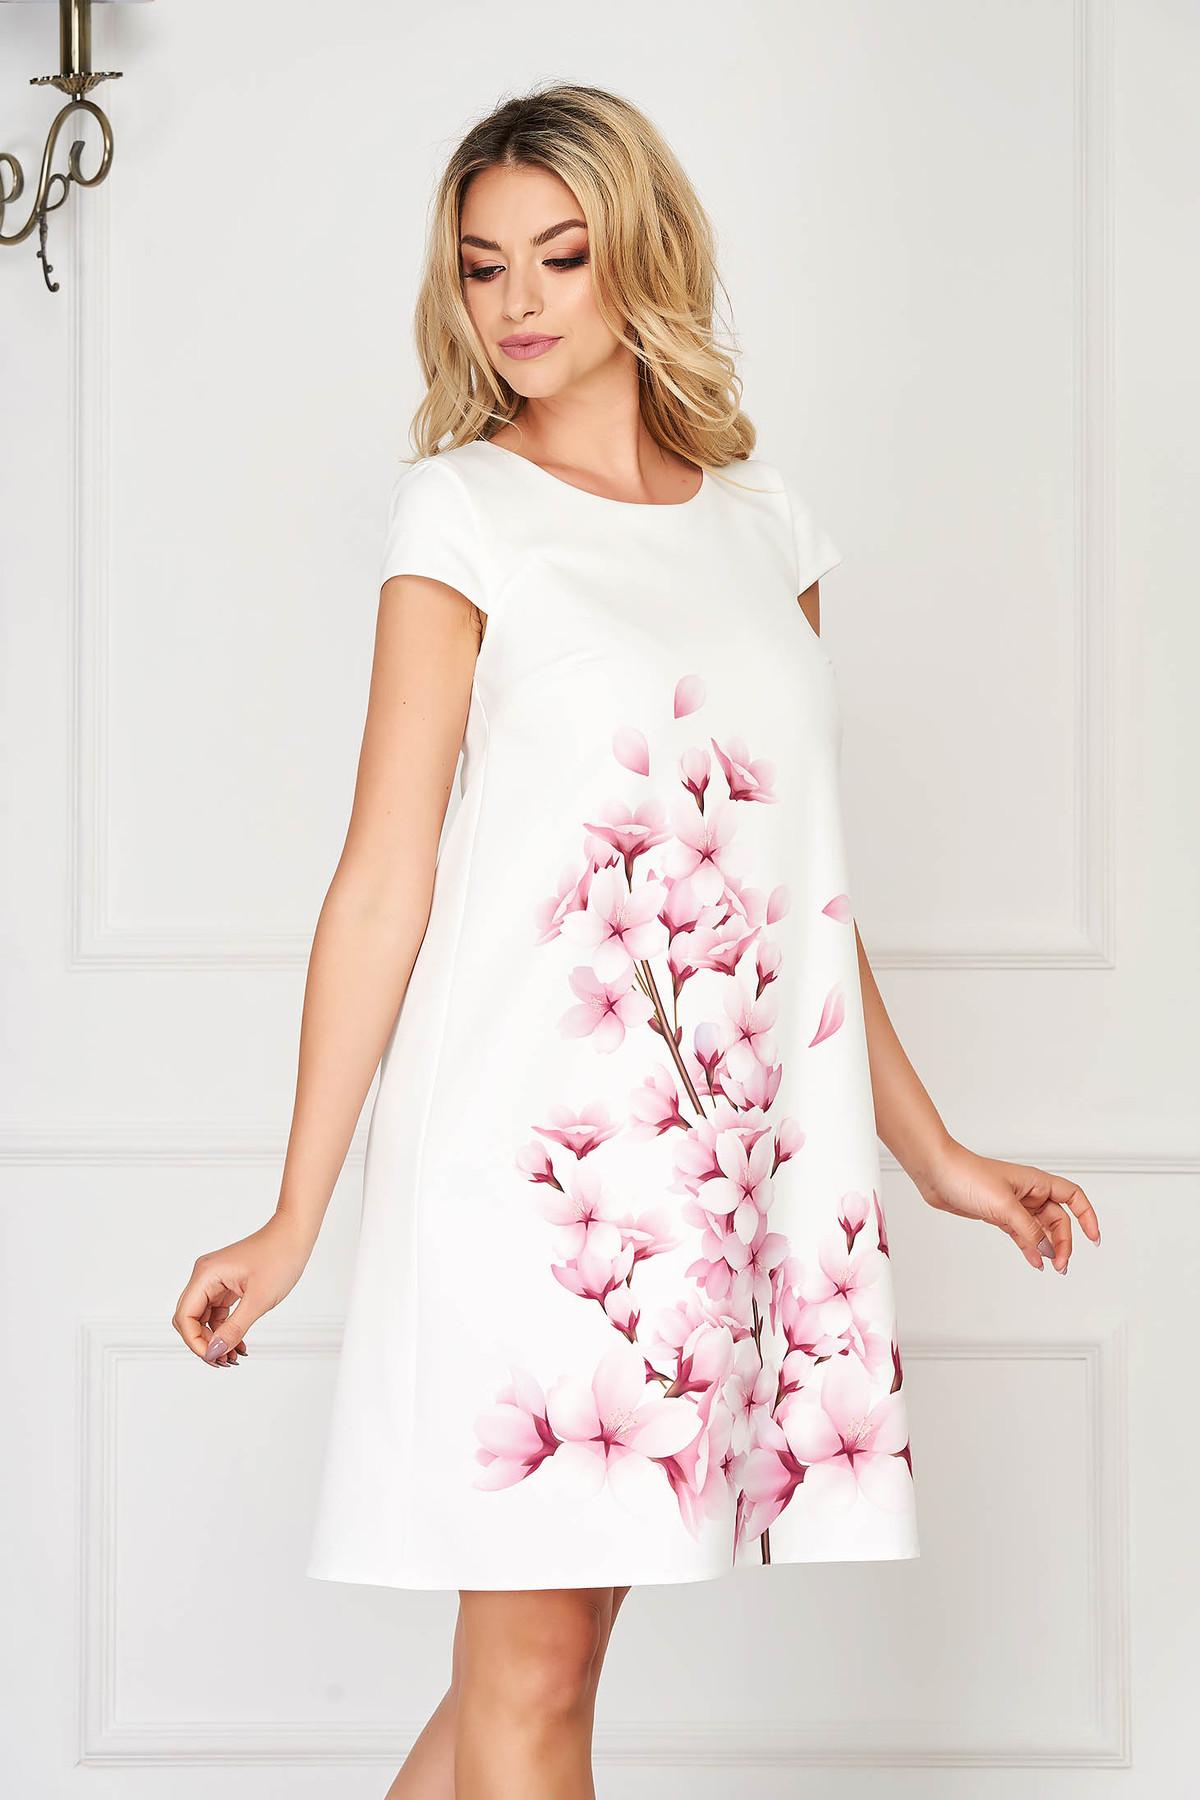 Rochie StarShinerS mov deschis eleganta scurta din stofa din material usor elastic cu imprimeu floral